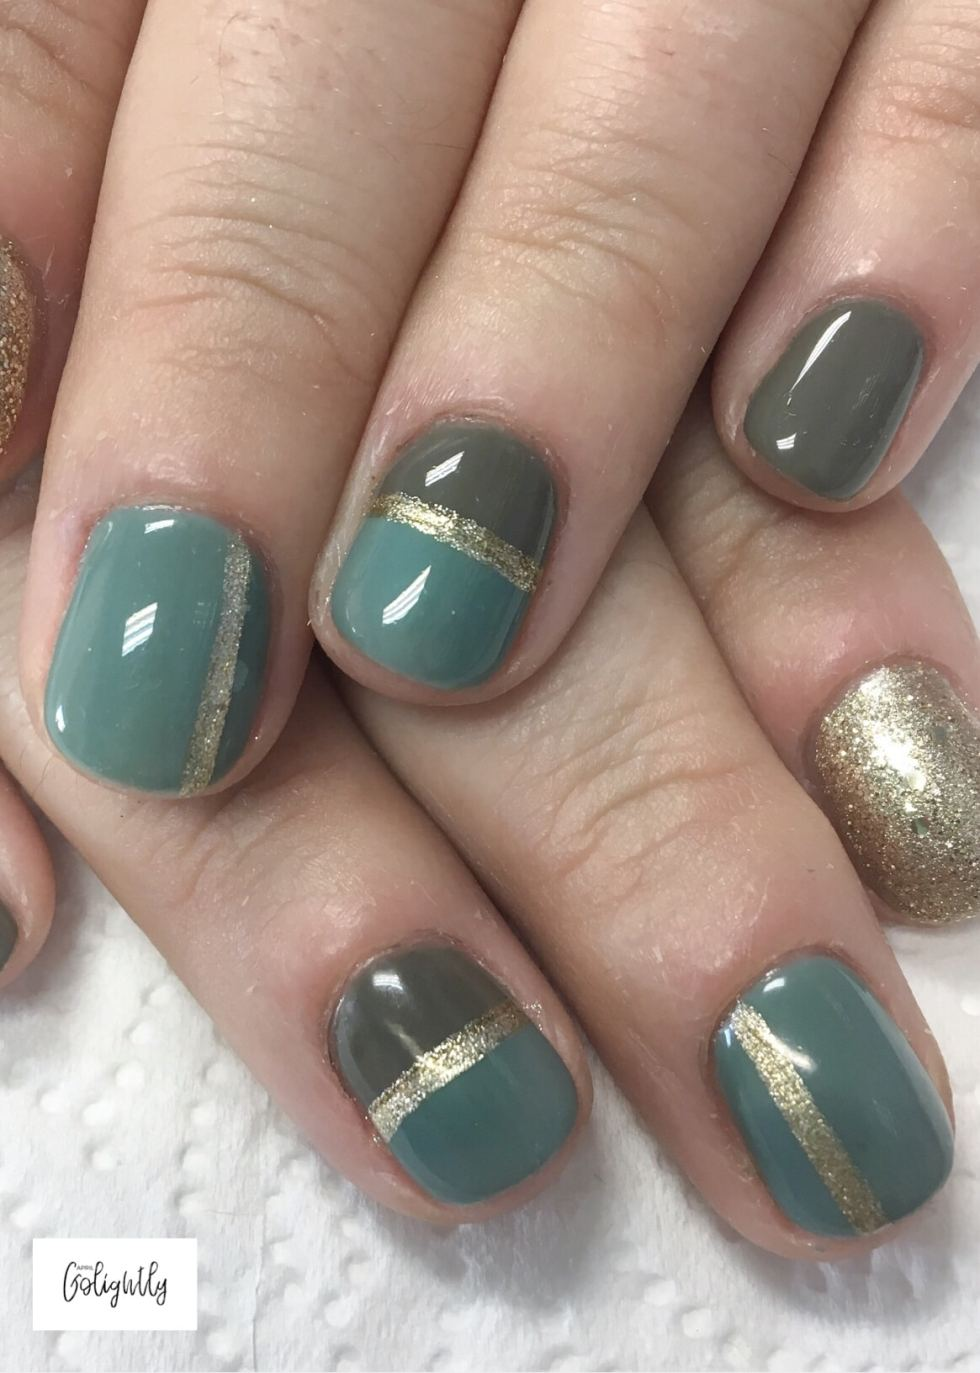 Green and Gold Nail designs color blocking for fall season